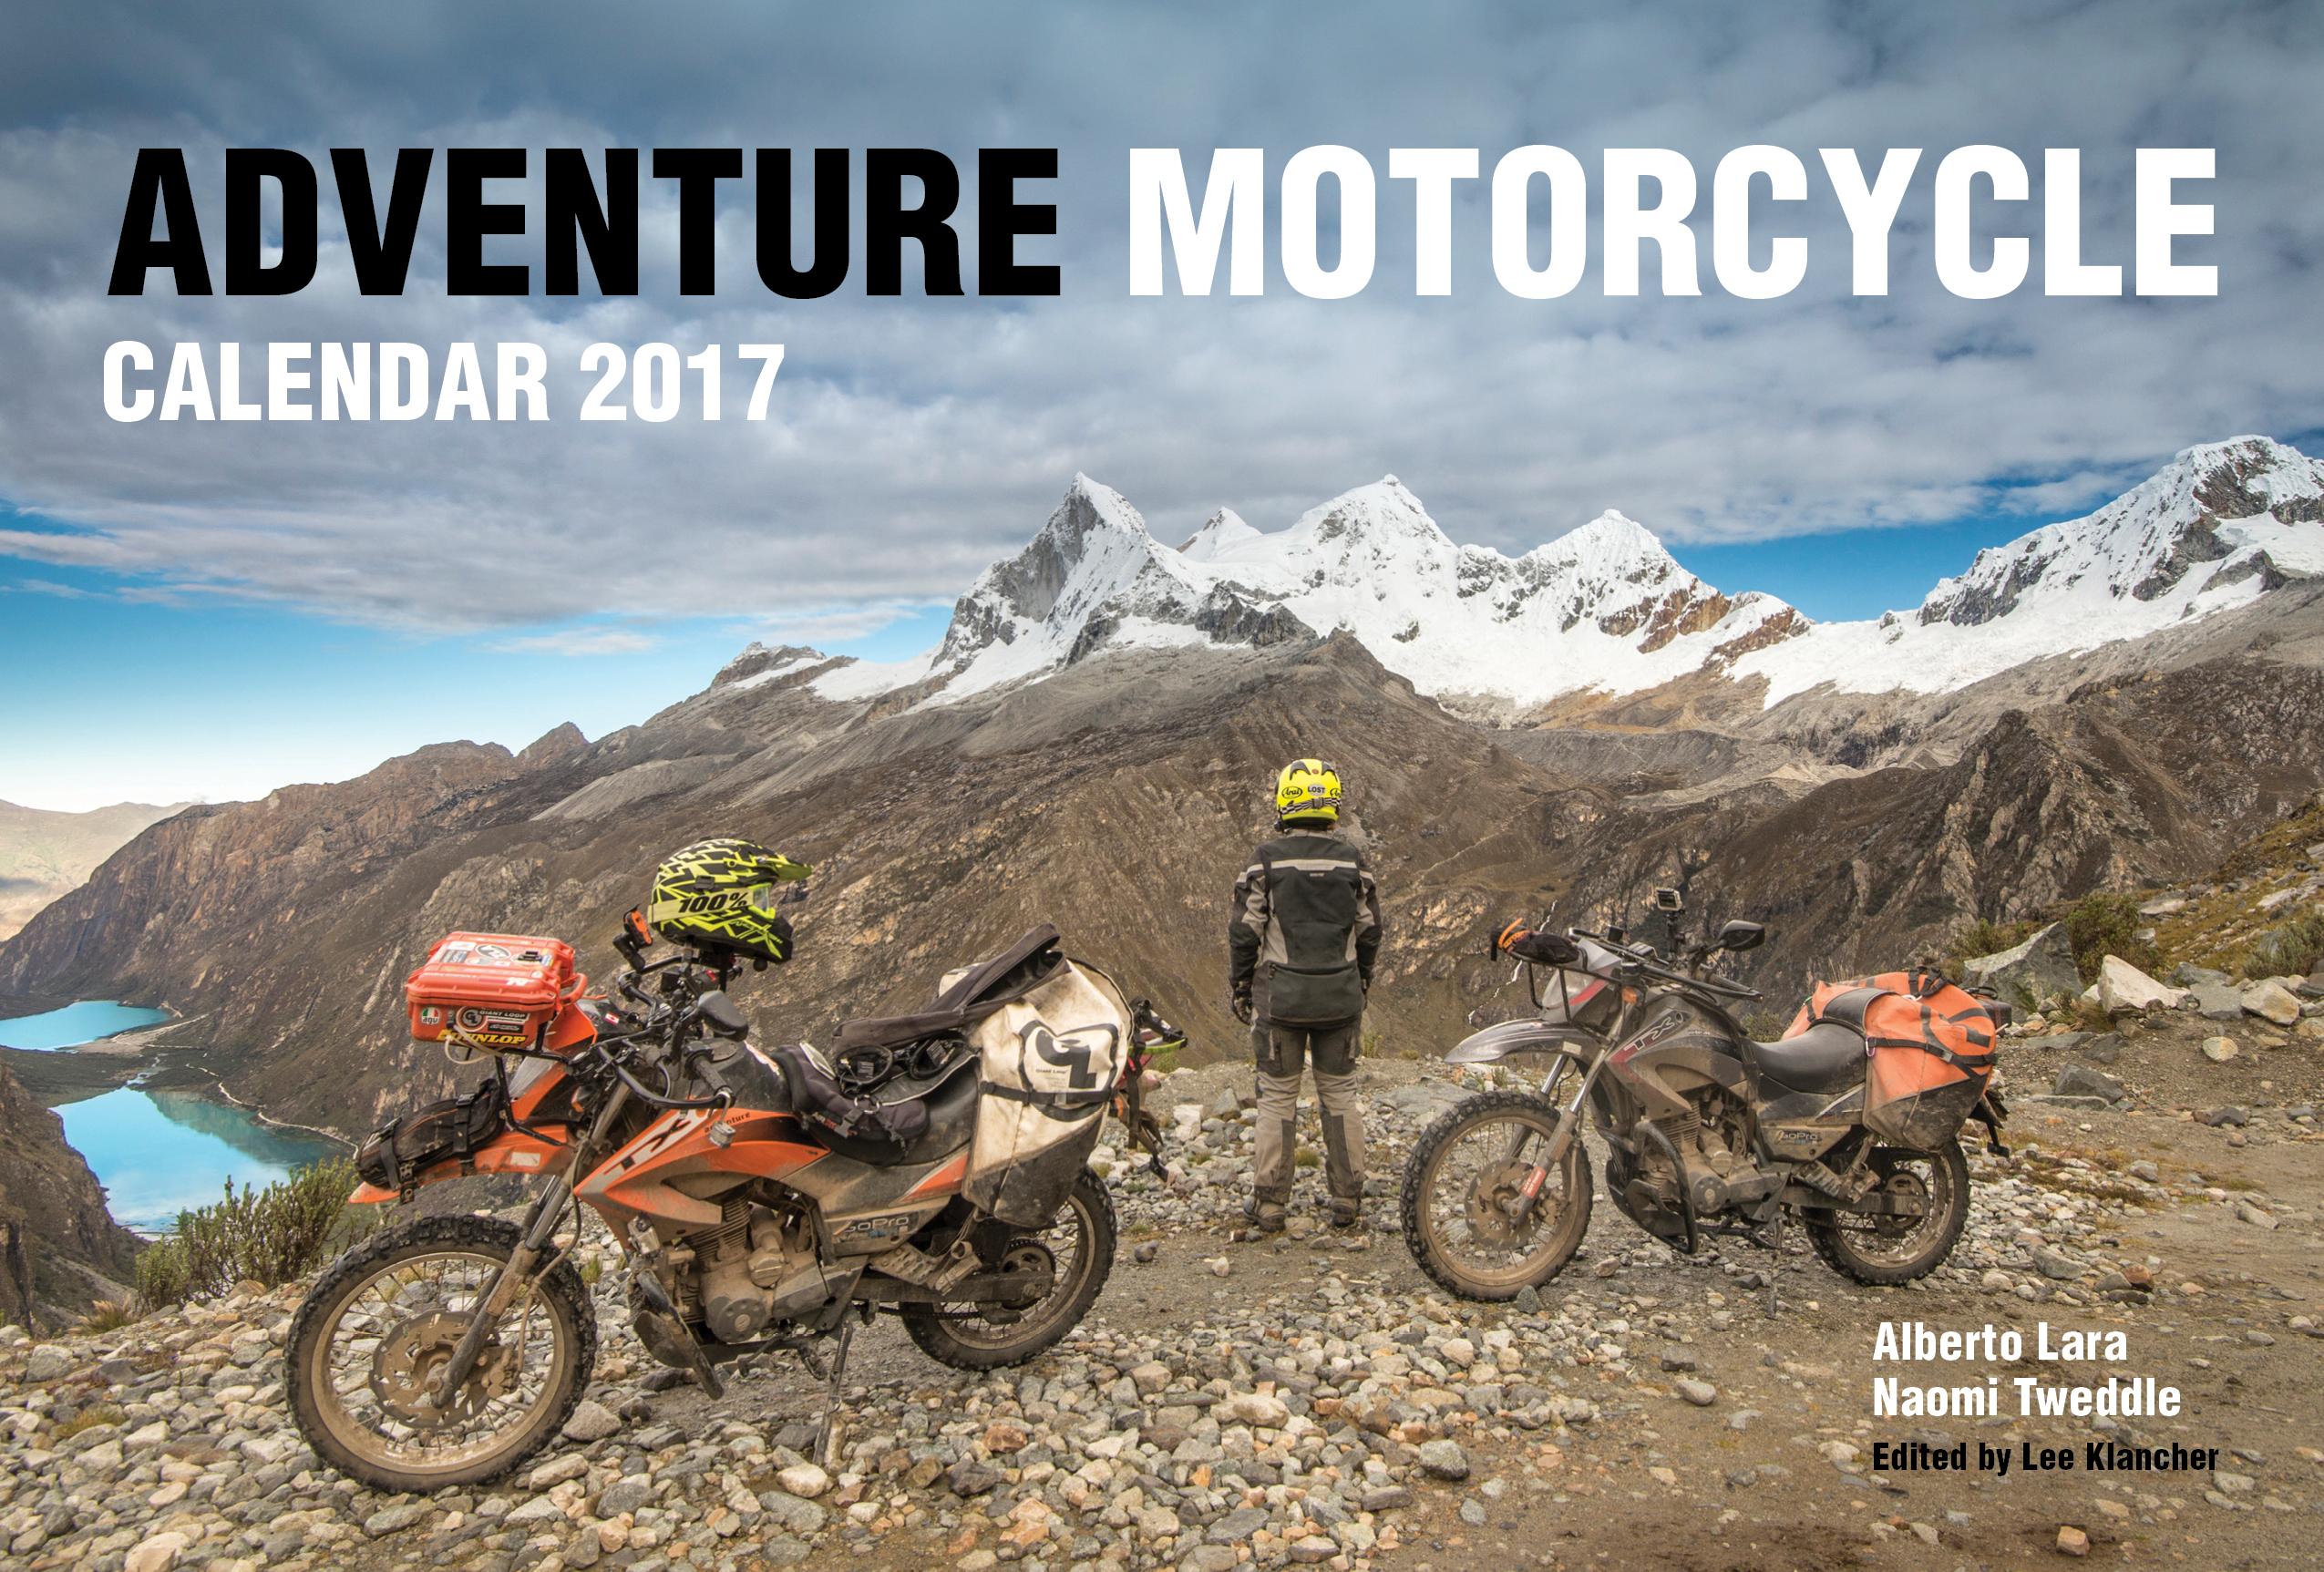 Adventure Motorcycle Calendar 2017 Octane Press